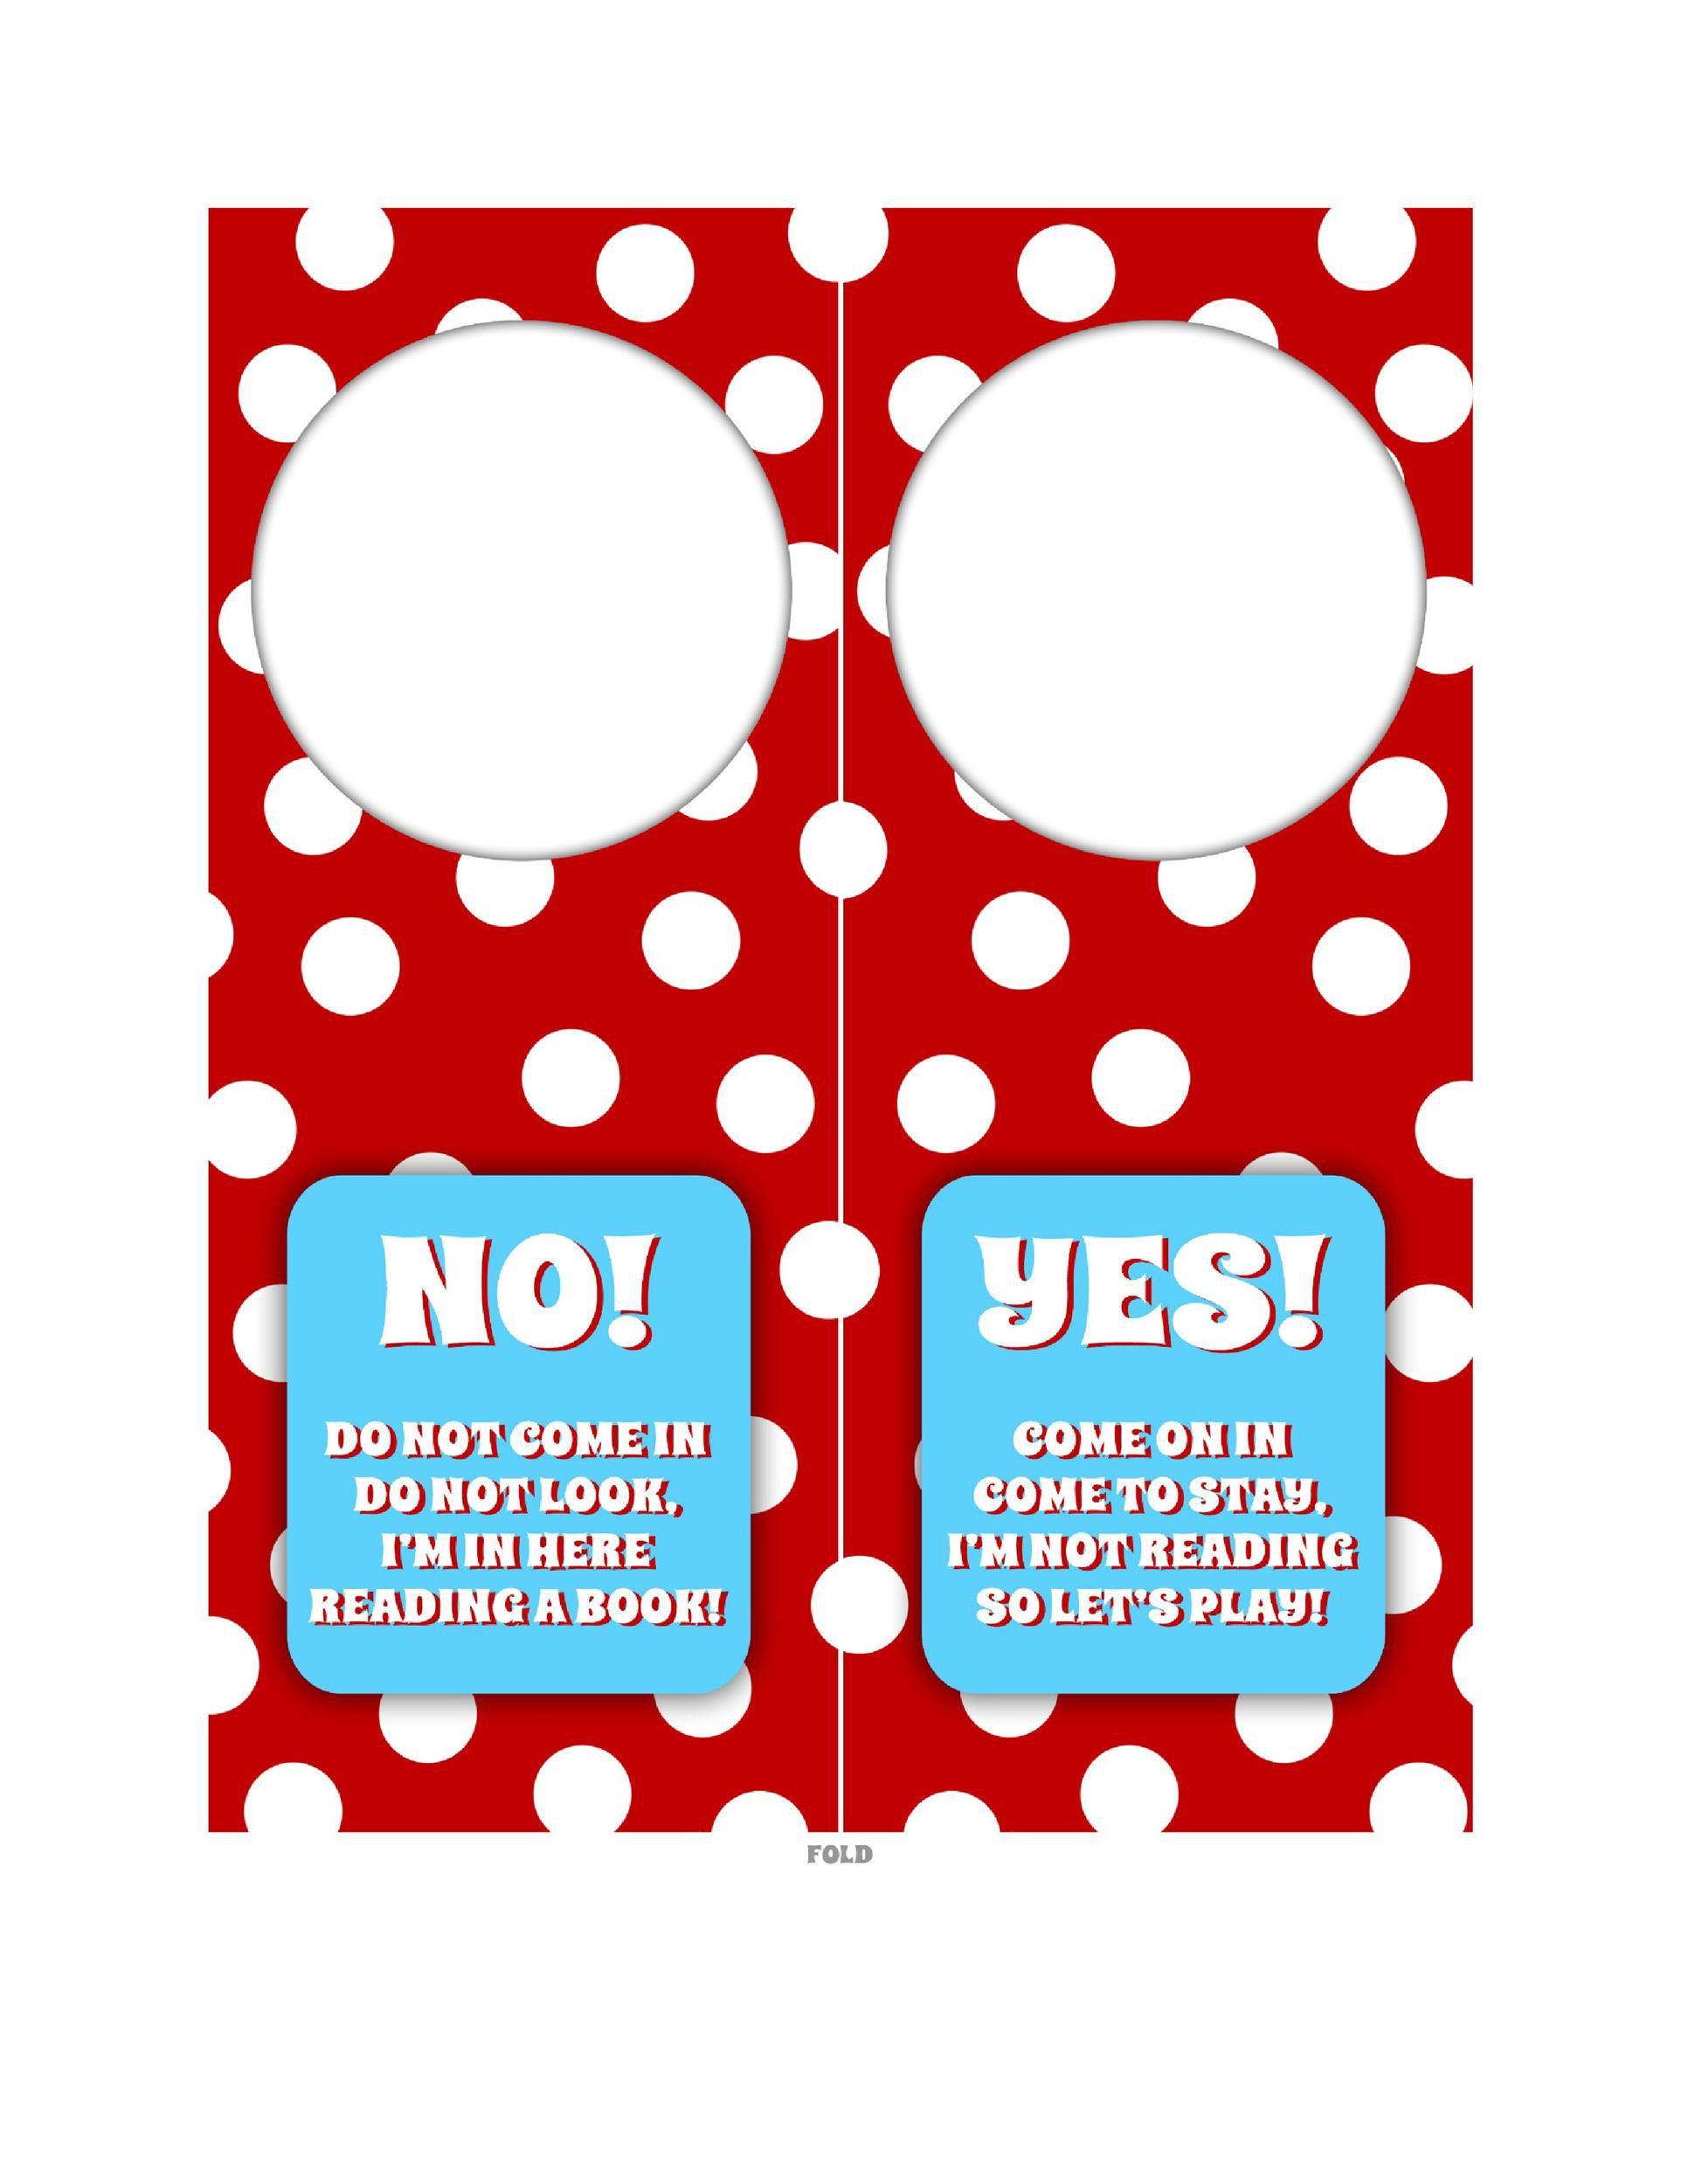 006 Staggering Free Printable Template For Door Hanger Design Full